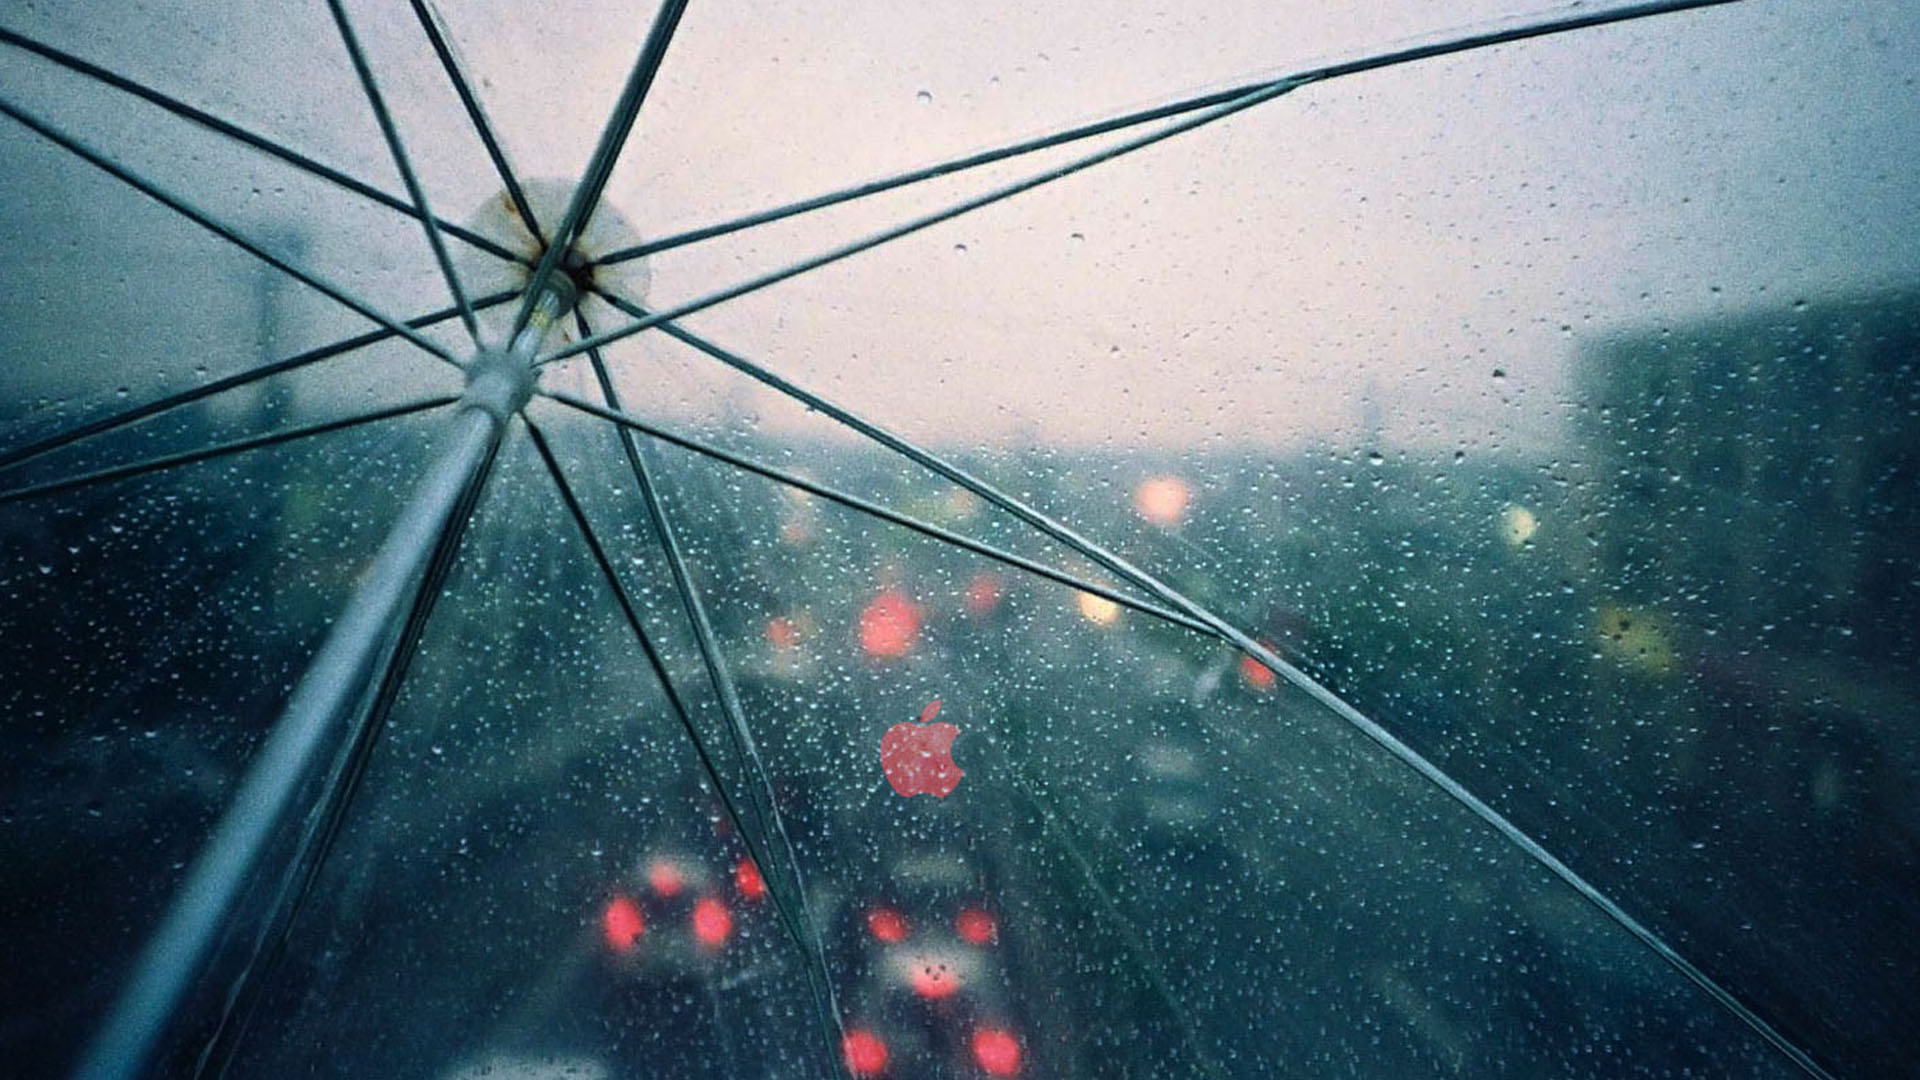 Cool Anime Wallpaper In Rain With Umbrella Rain Drops Hd Desktop Wallpaper Fullscreen Mobile Dual Monitor 1920x1080